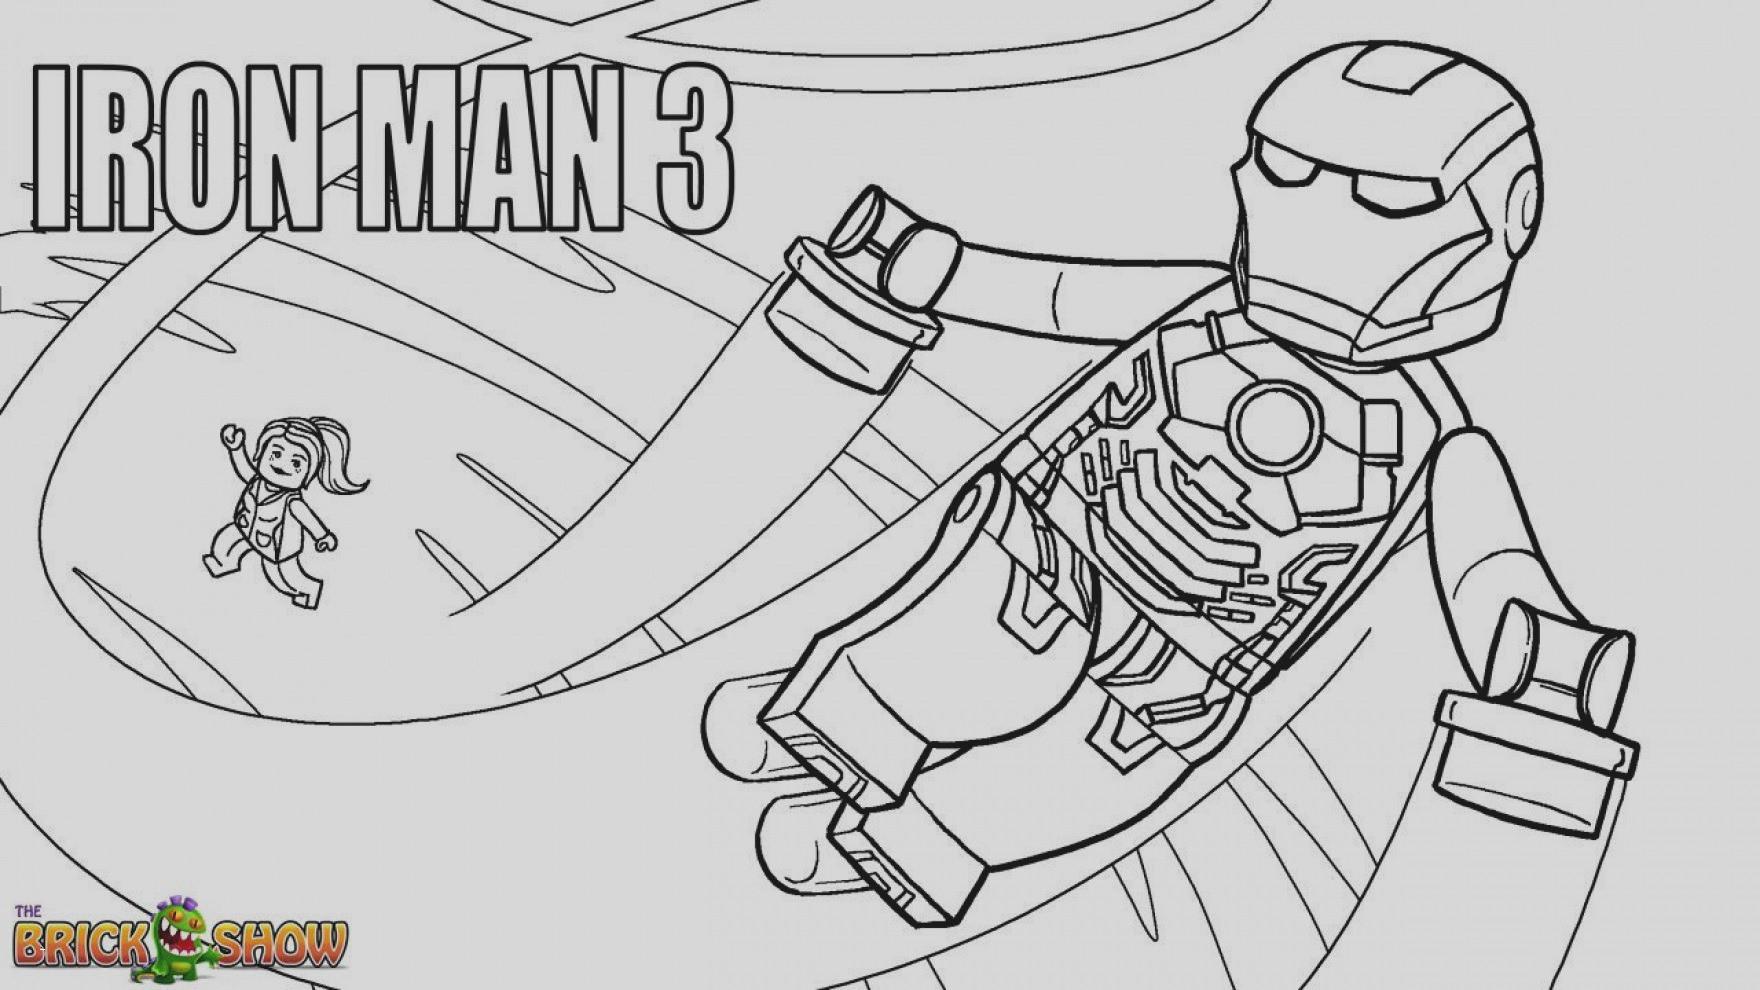 Spiderman Bilder Zum Ausmalen Neu Spiderman Malvorlagen Neu Spiderman Ausmalbilder Zum Ausdrucken Fotografieren